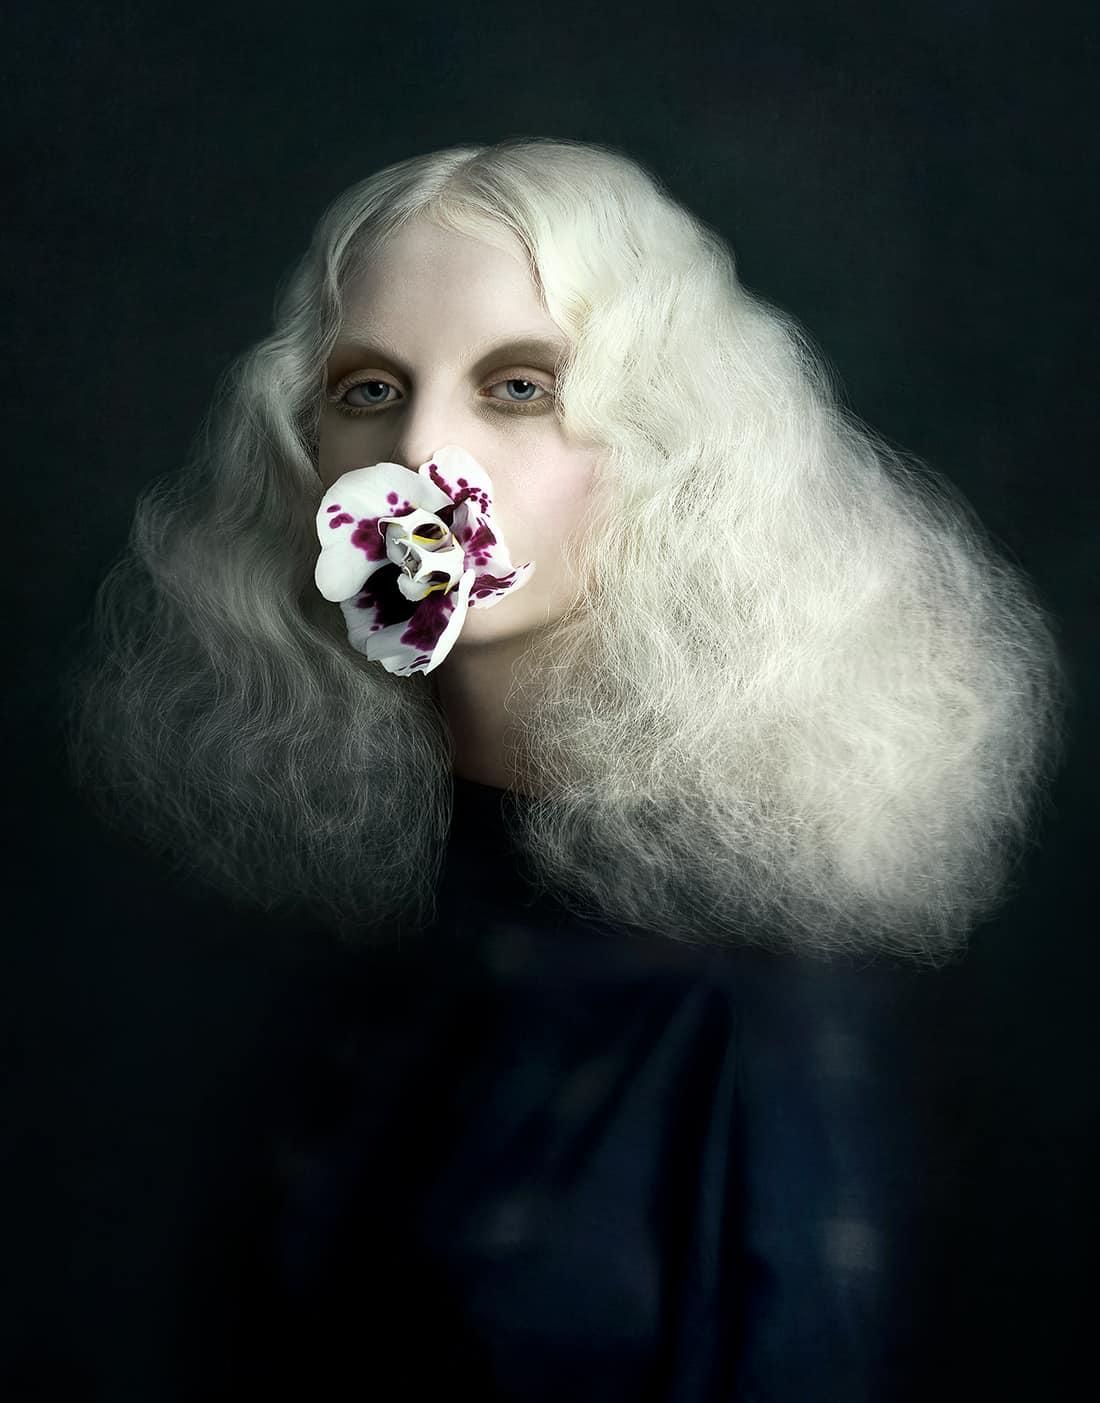 Justine Tjallinks - Past Present Future